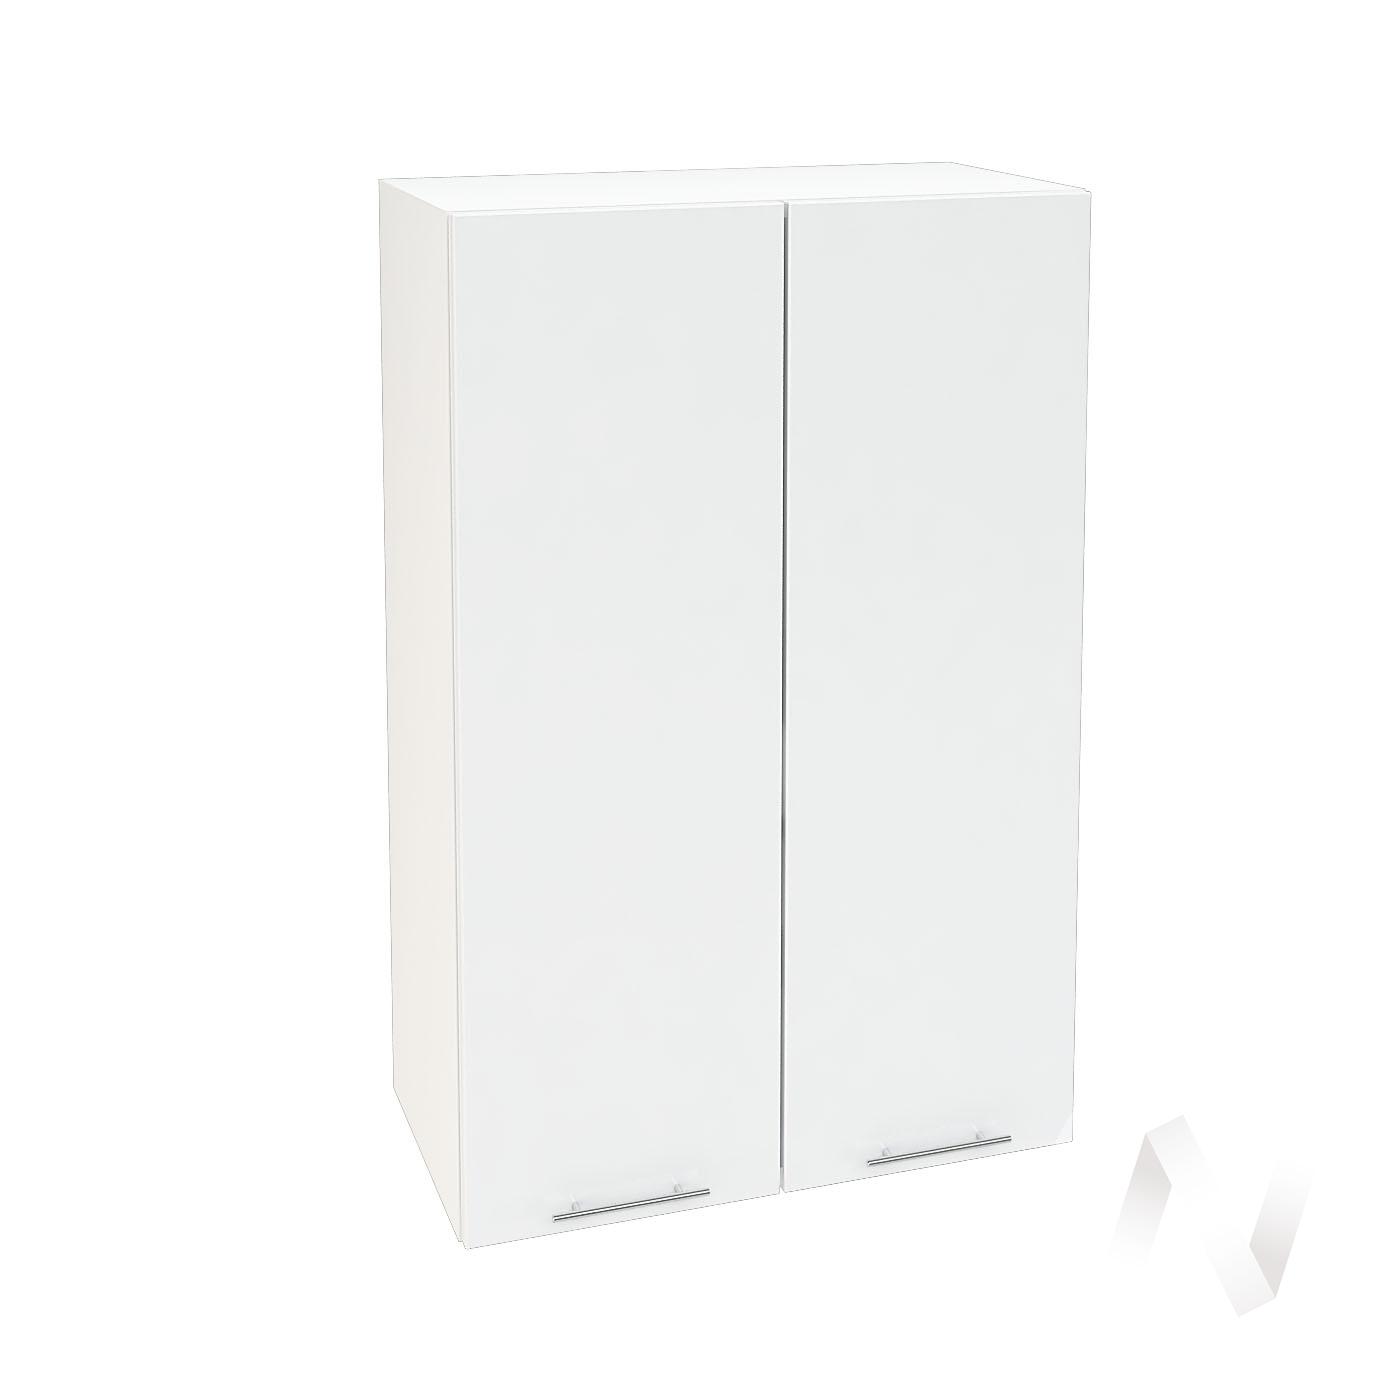 "Кухня ""Валерия-М"": Шкаф верхний 609, ШВ 609 (белый глянец/корпус белый)"